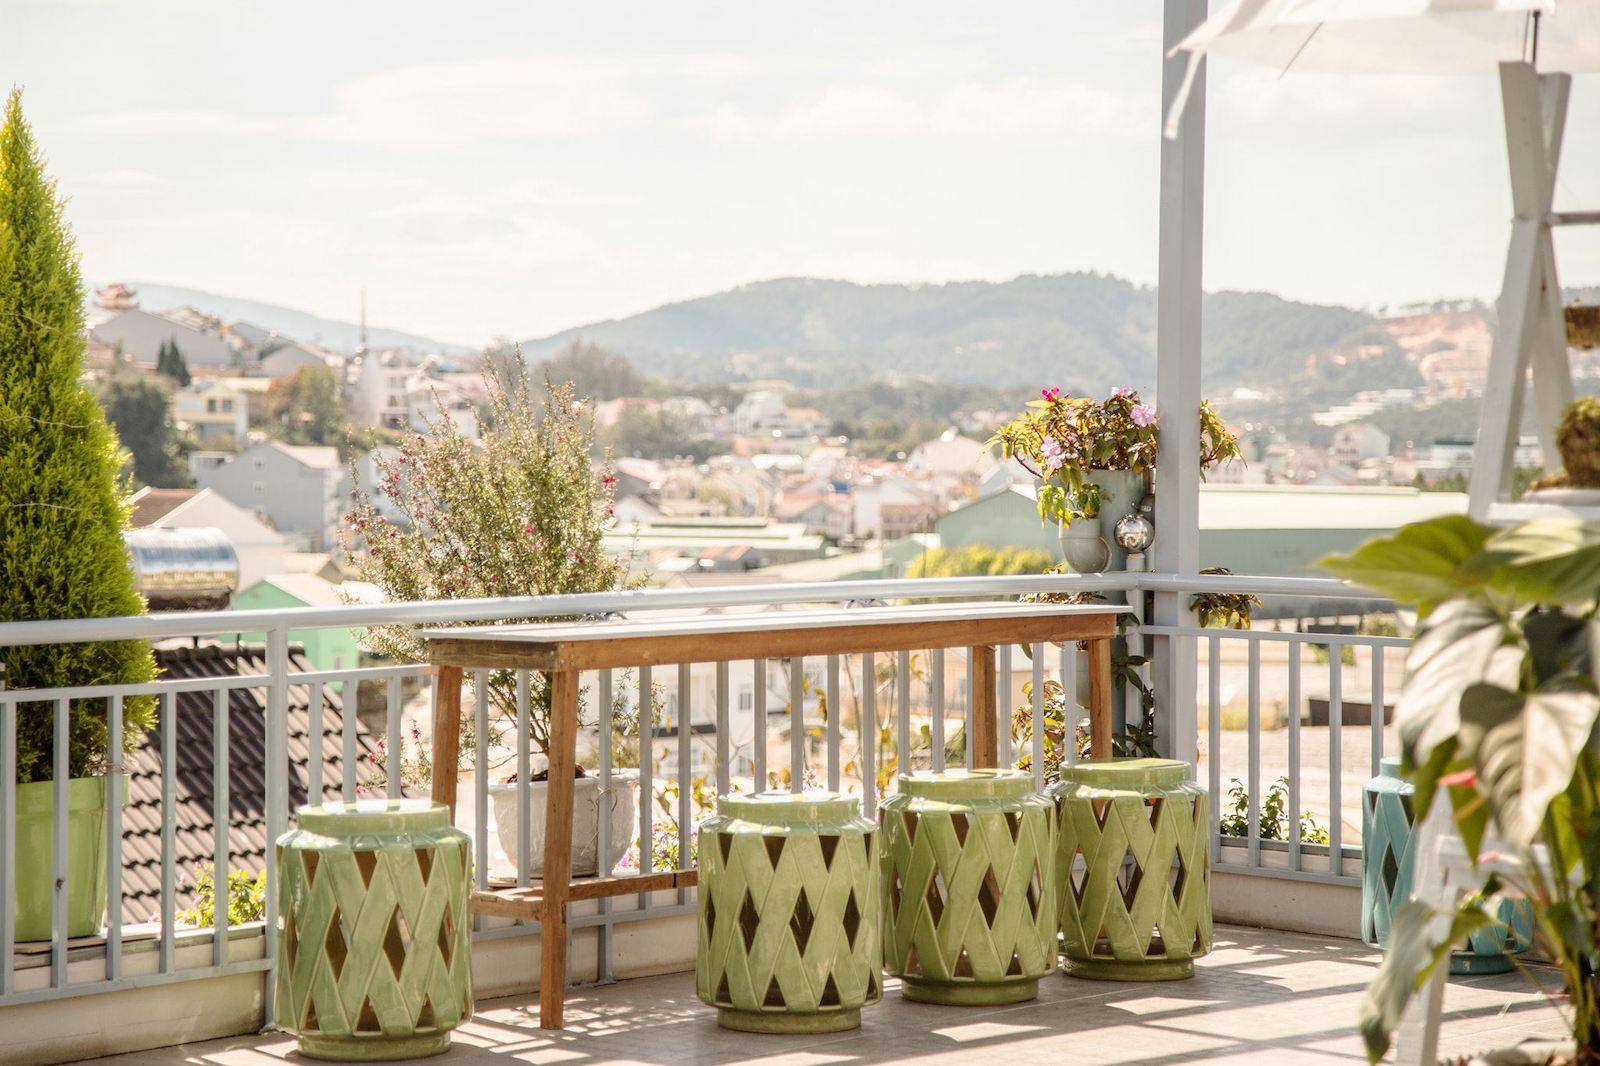 Image of the view from the rooftop at Nhà của Người và Ta homestay in Dalat, Vietnam